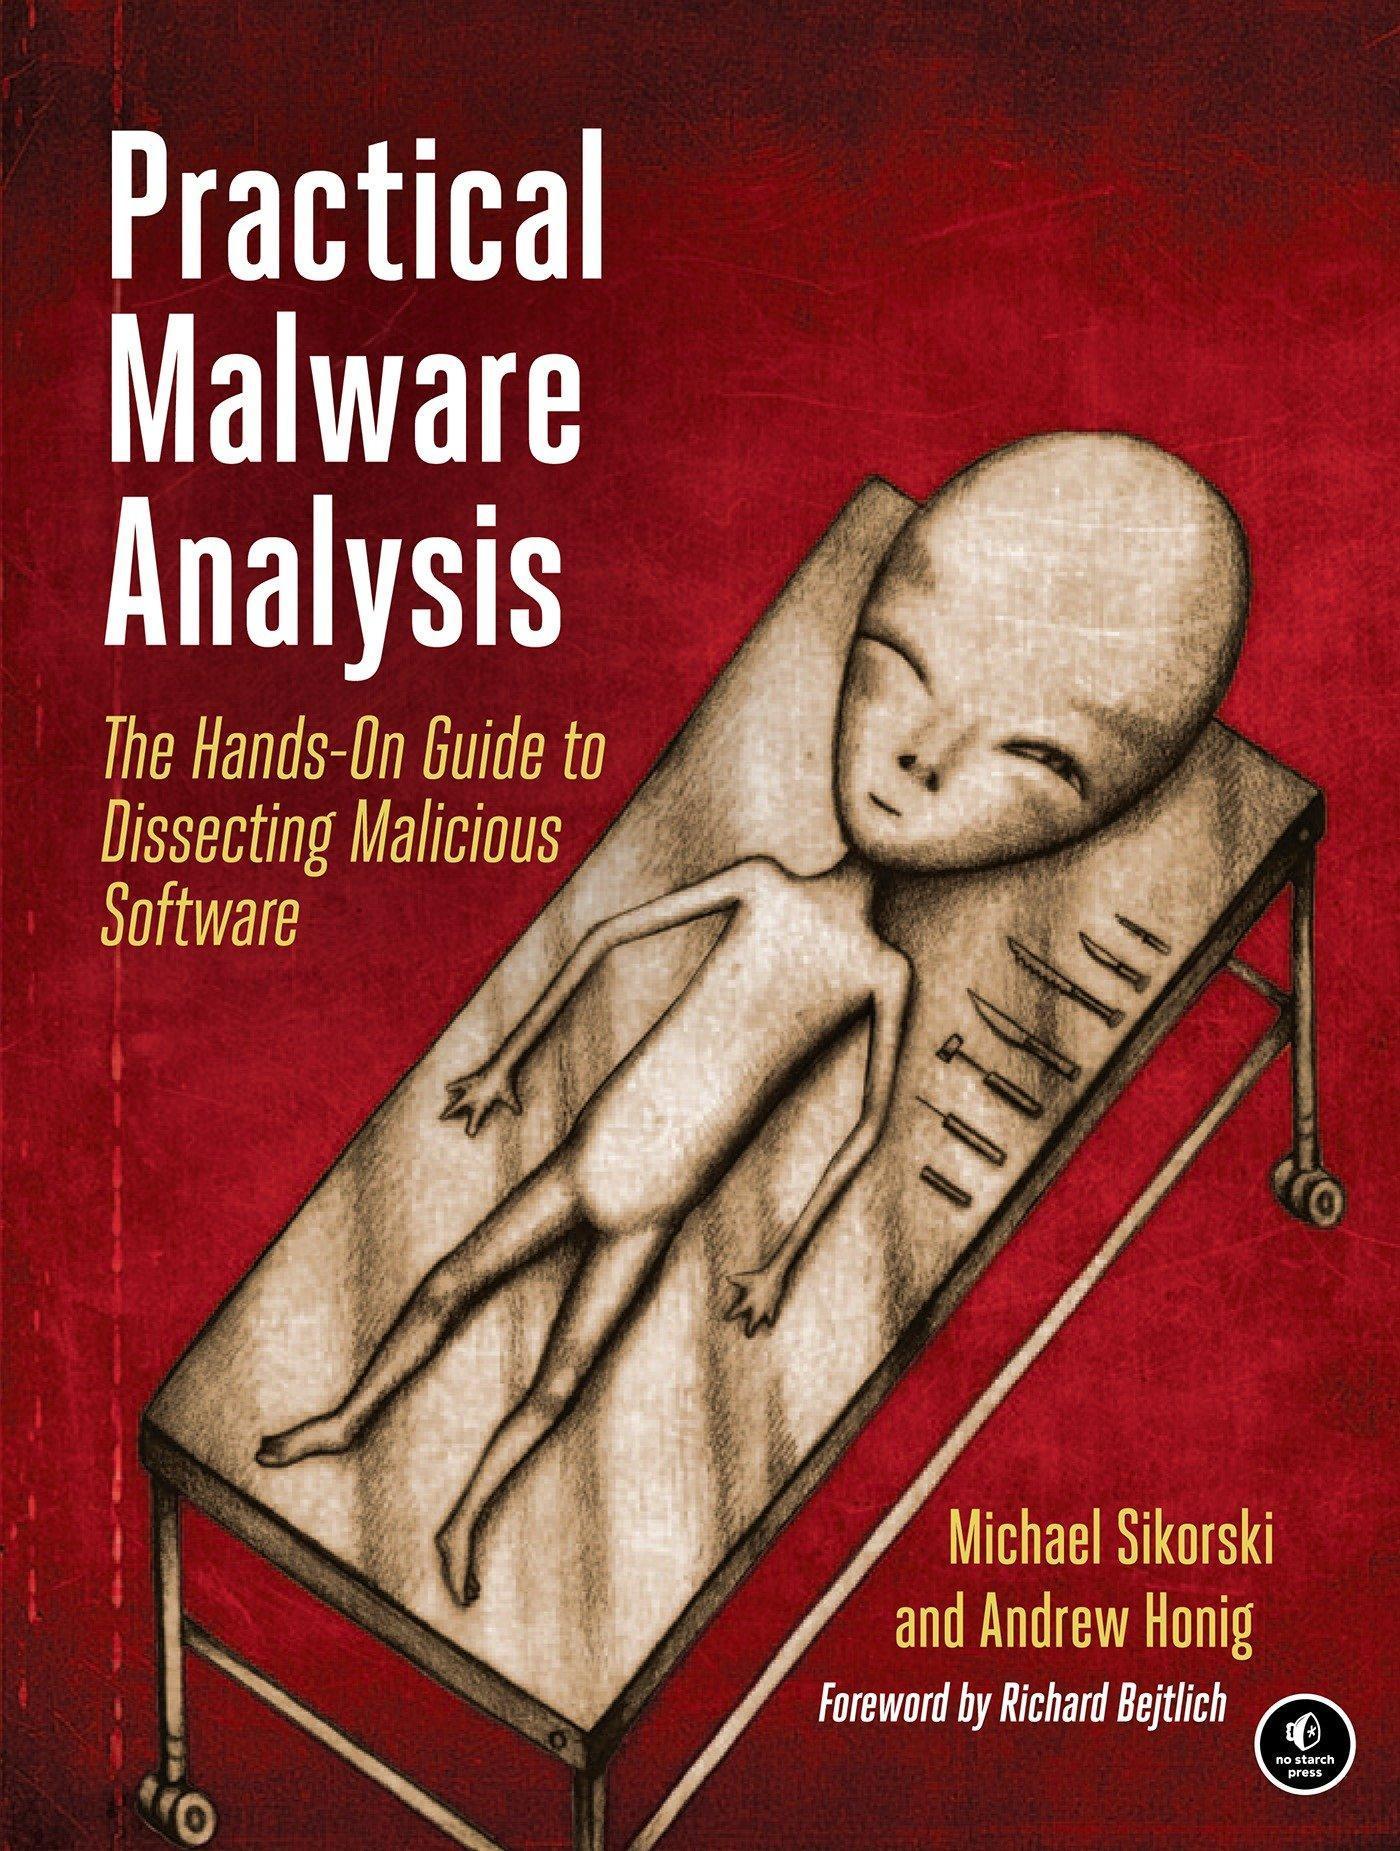 Practical Malware Analysis Michael Sikorski